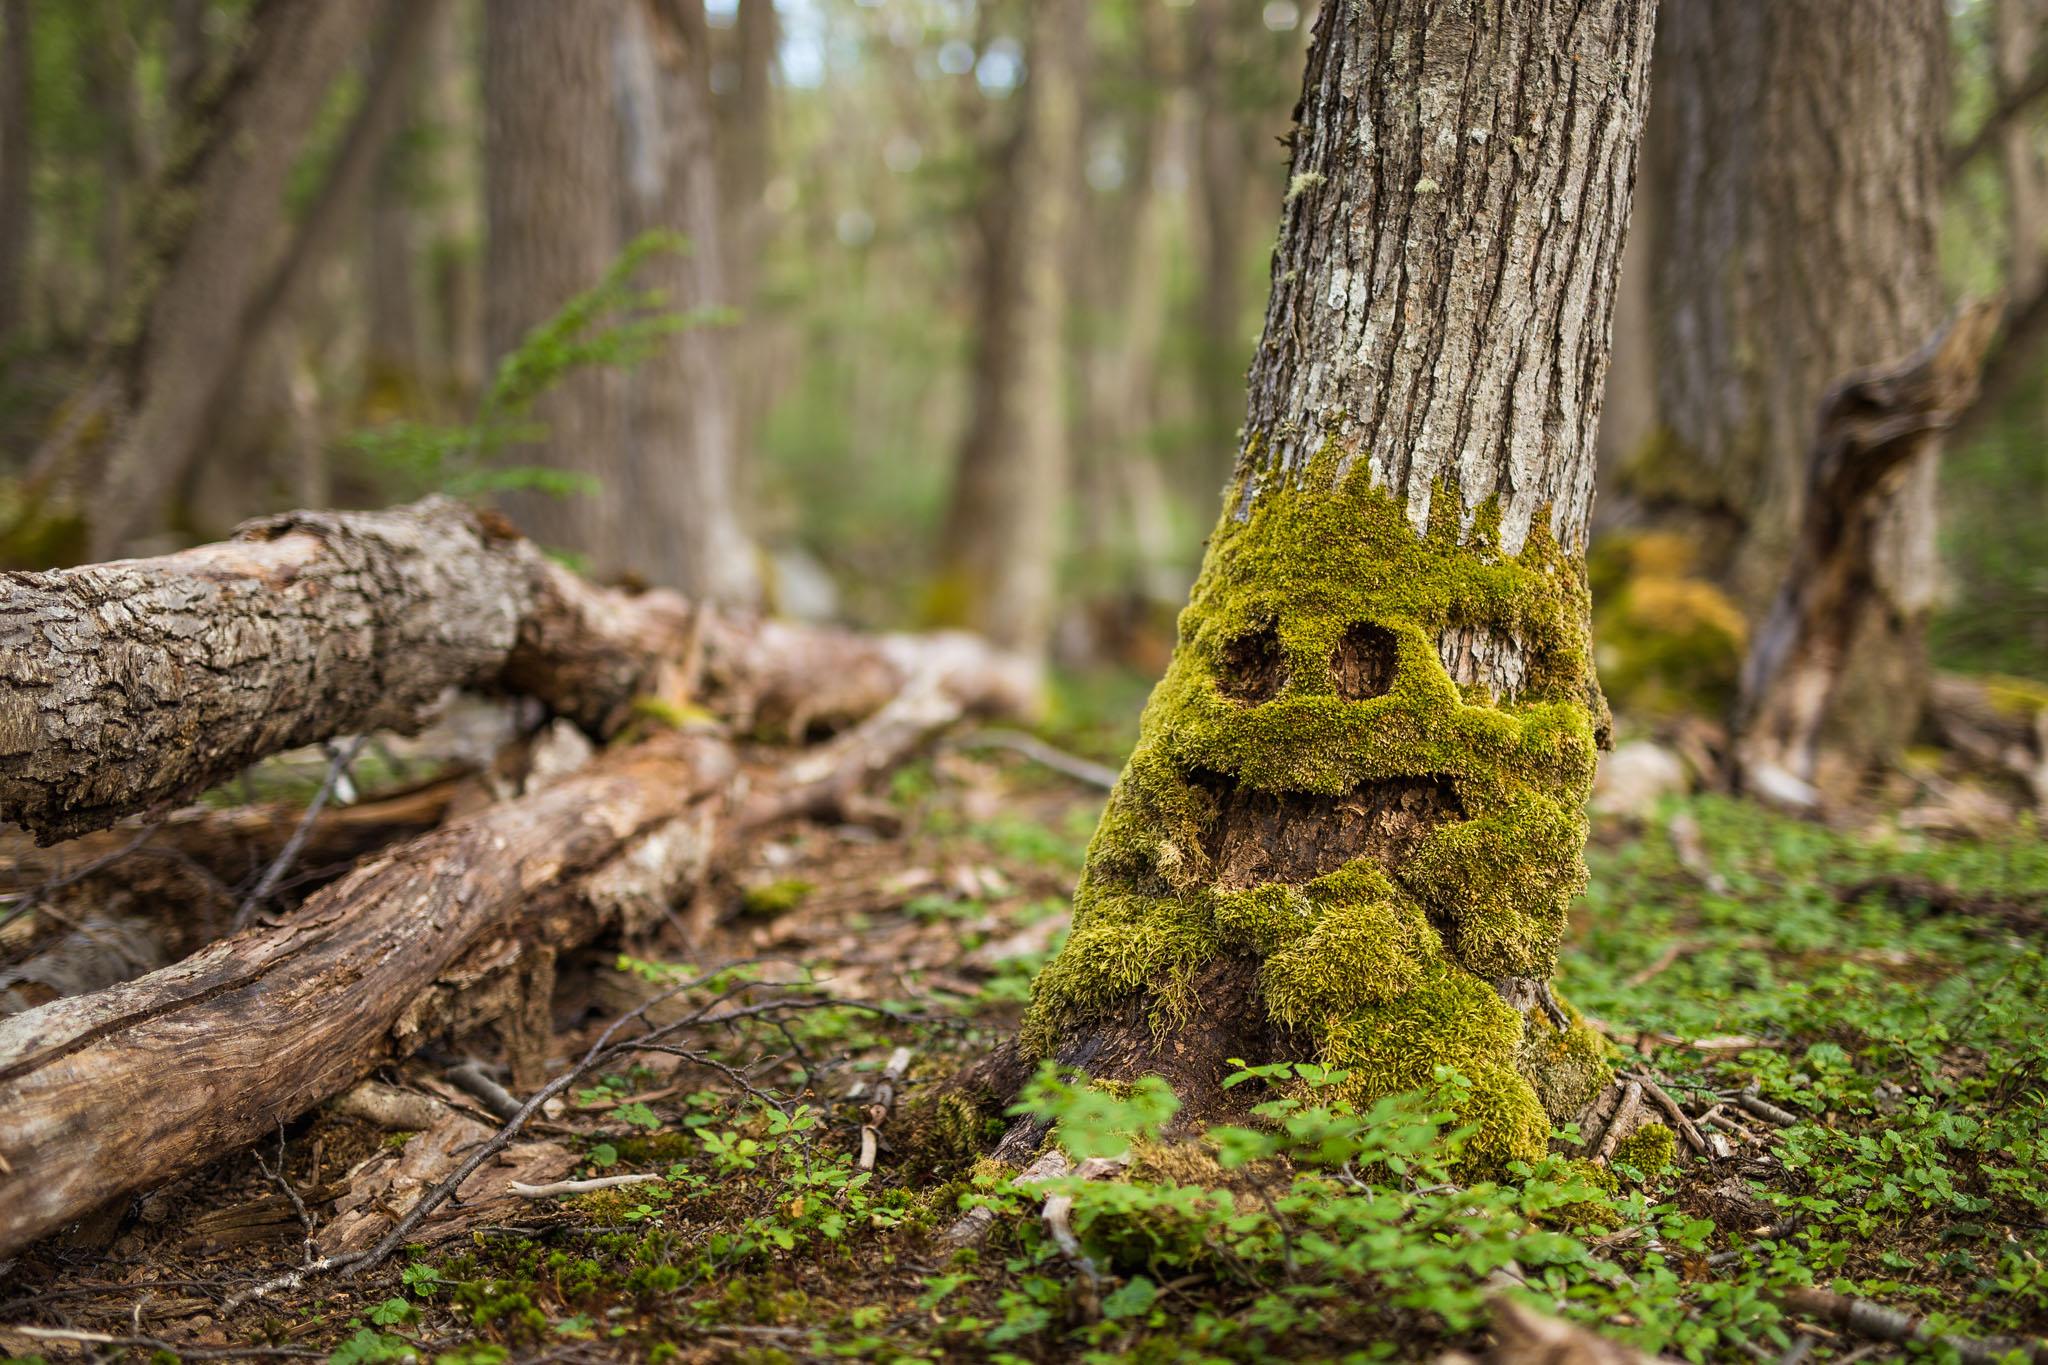 Wedding-travellers-ushuaia-argentina-laguna-esmeralda-smiling-tree-moss